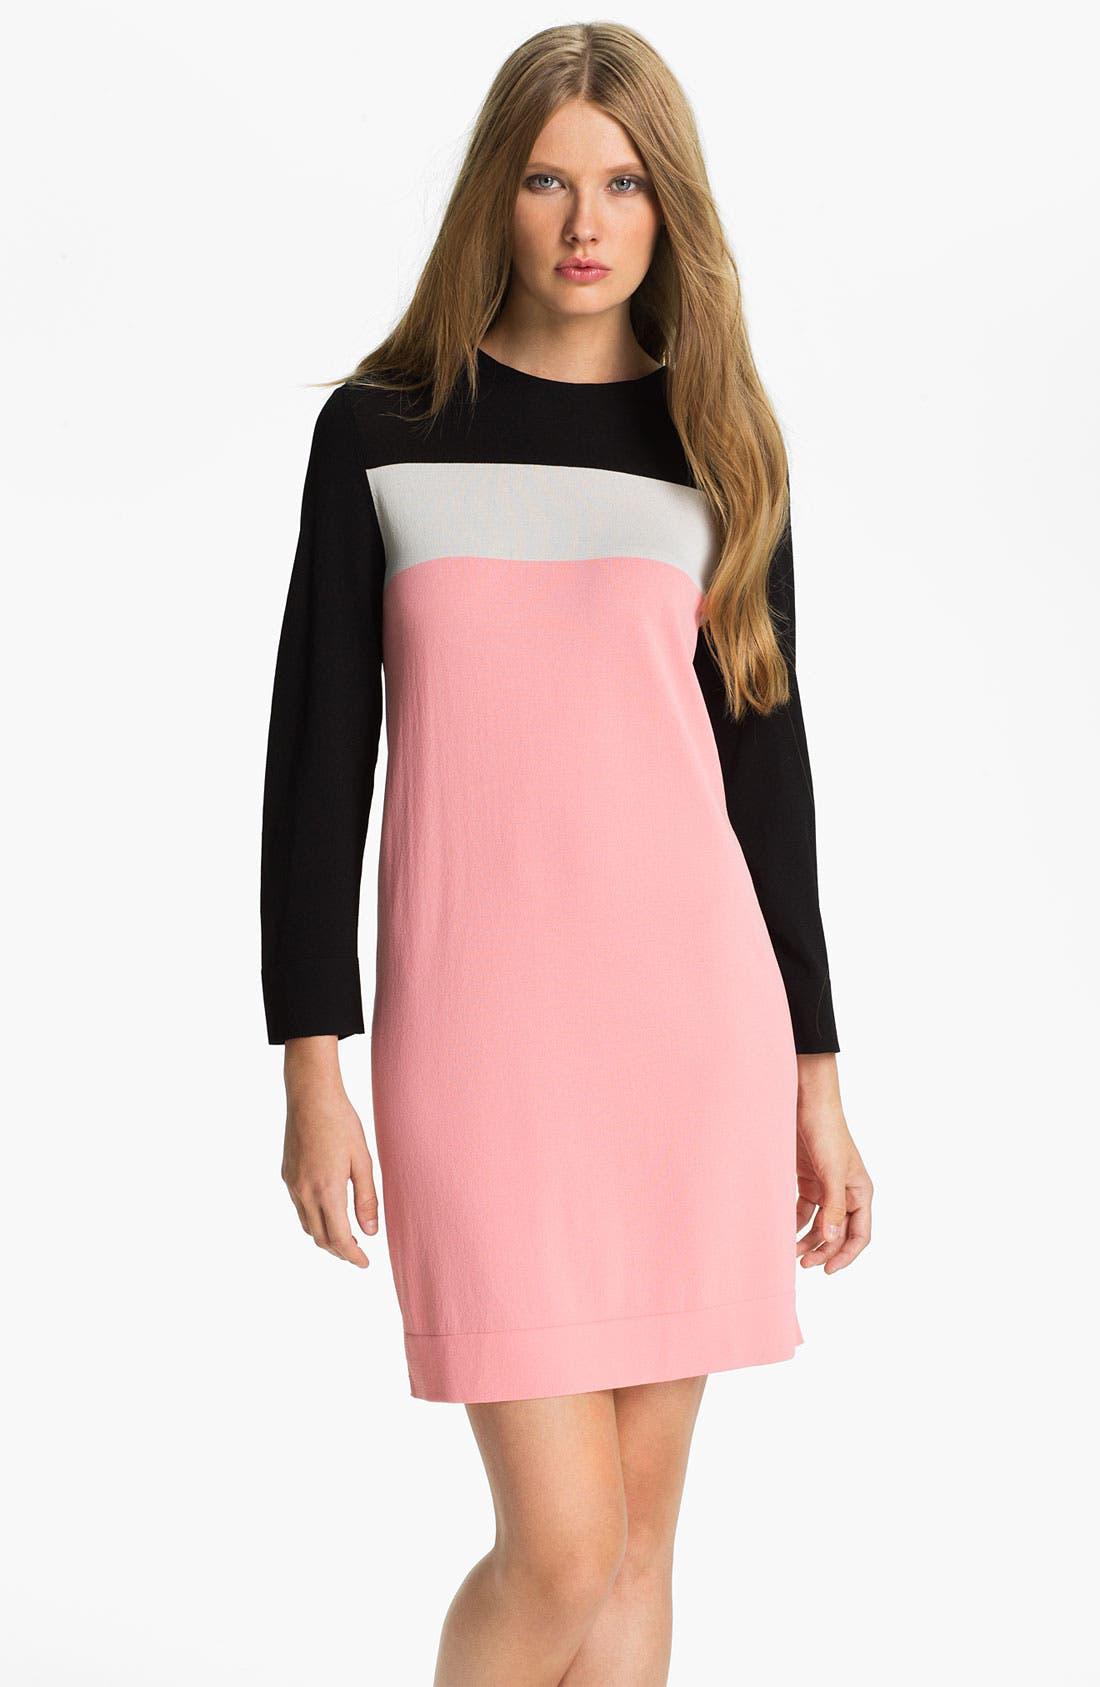 Alternate Image 1 Selected - Diane von Furstenberg 'Diana' Knit Shift Dress